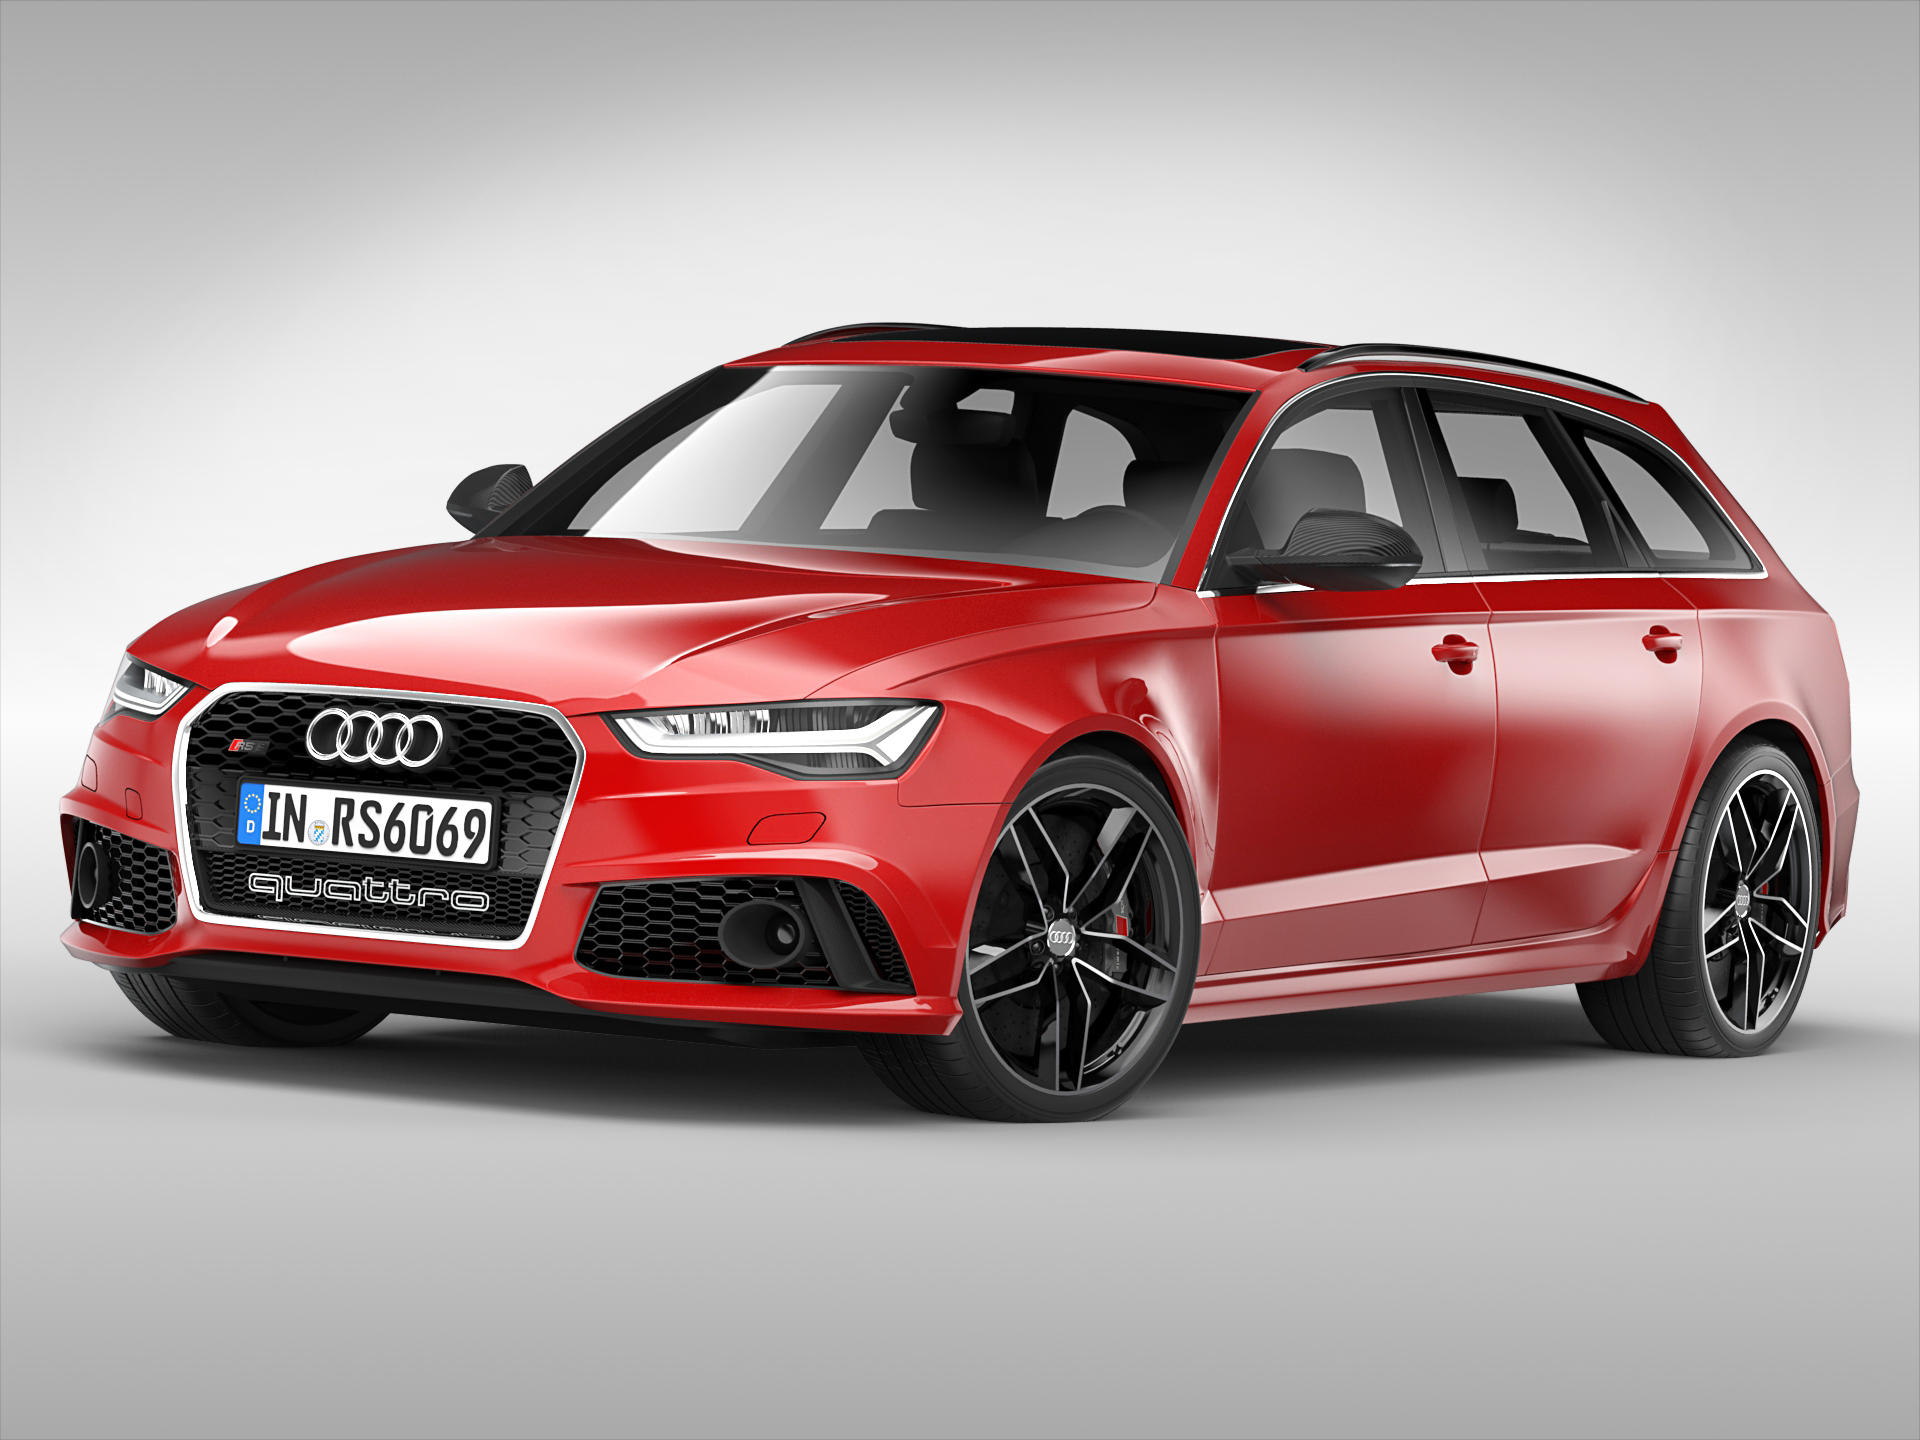 Kelebihan Kekurangan Audi Rs6 2017 Murah Berkualitas